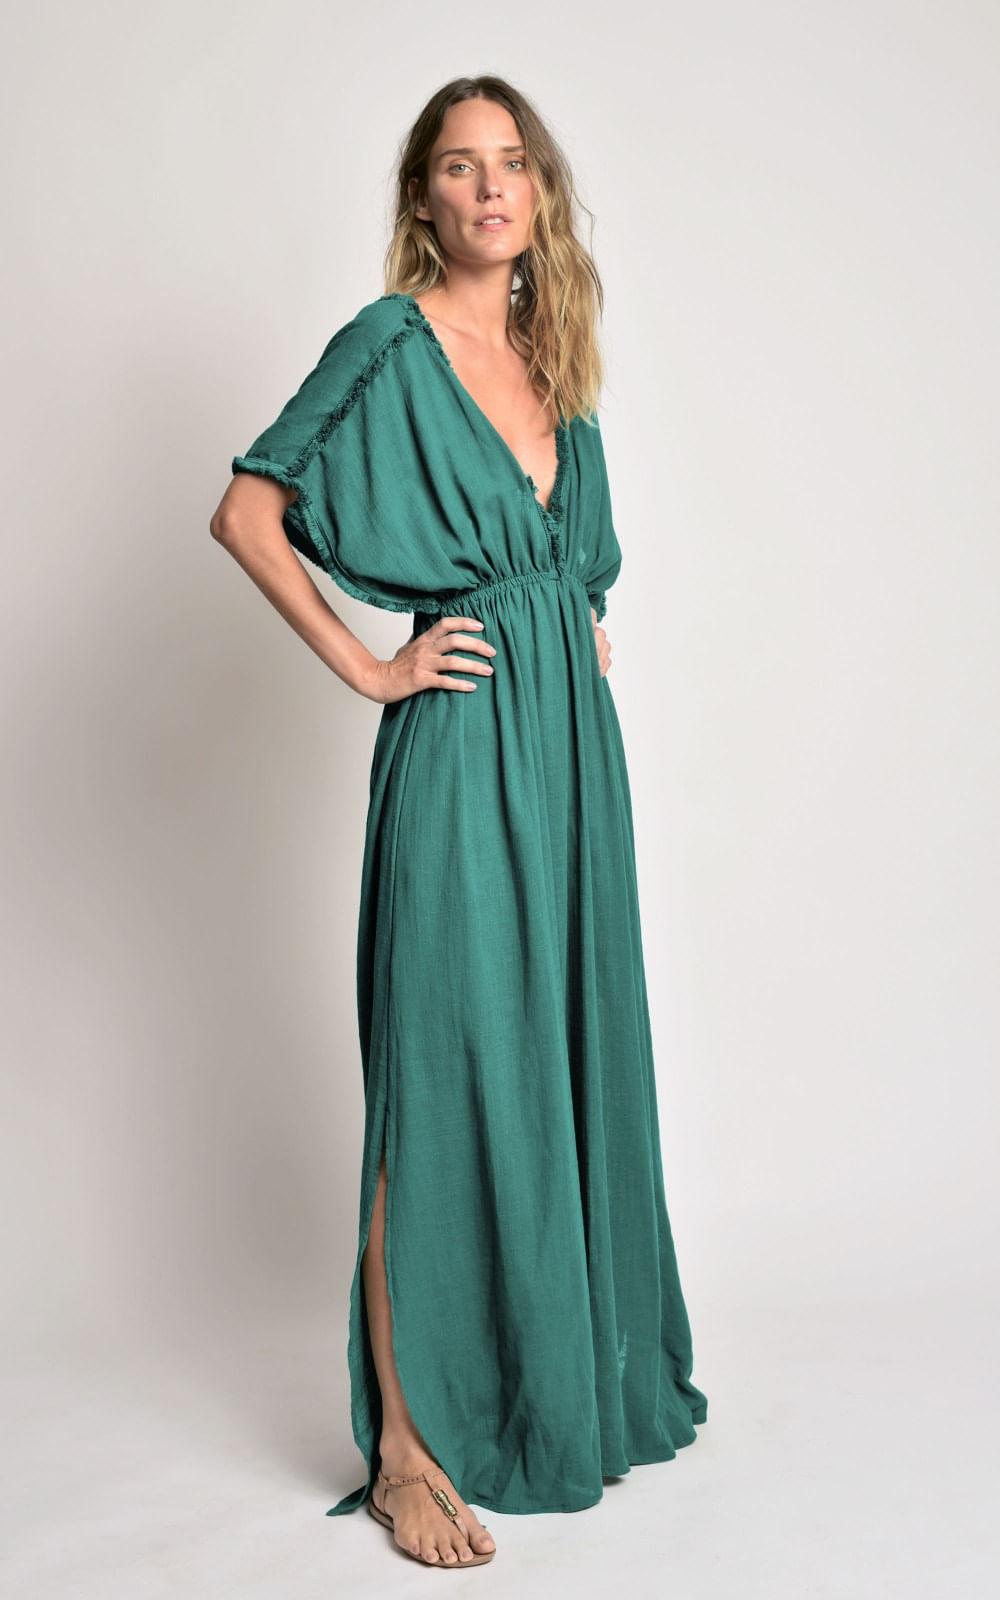 bd01b6378 Vestido Detalhe Franjas Capri - Lenny Niemeyer